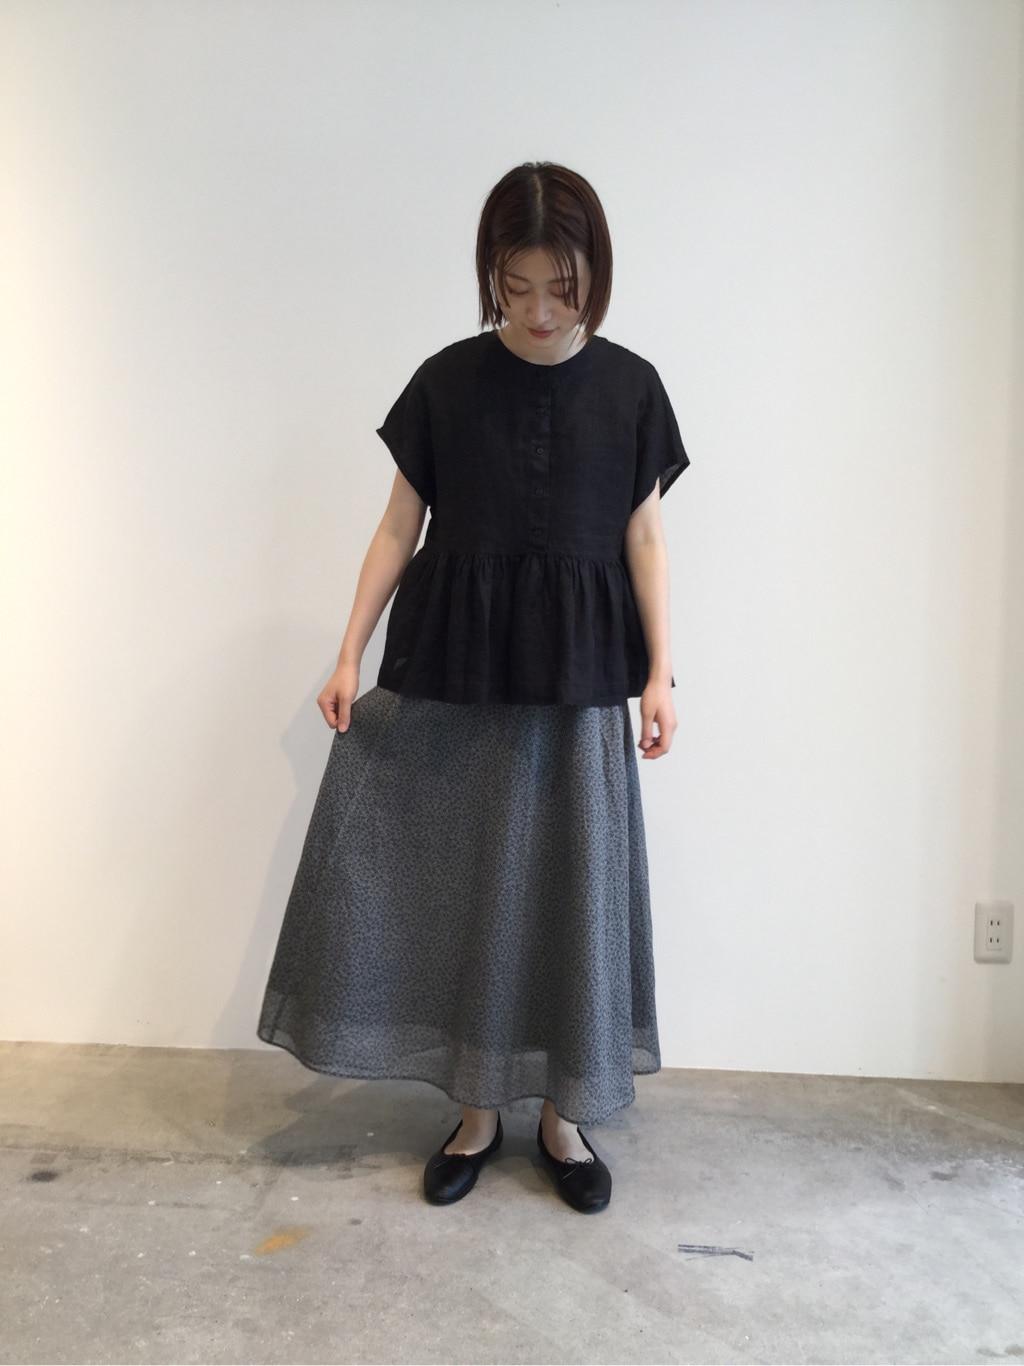 - bulle de savon FLAT AMB 名古屋栄路面 身長:162cm 2020.08.16